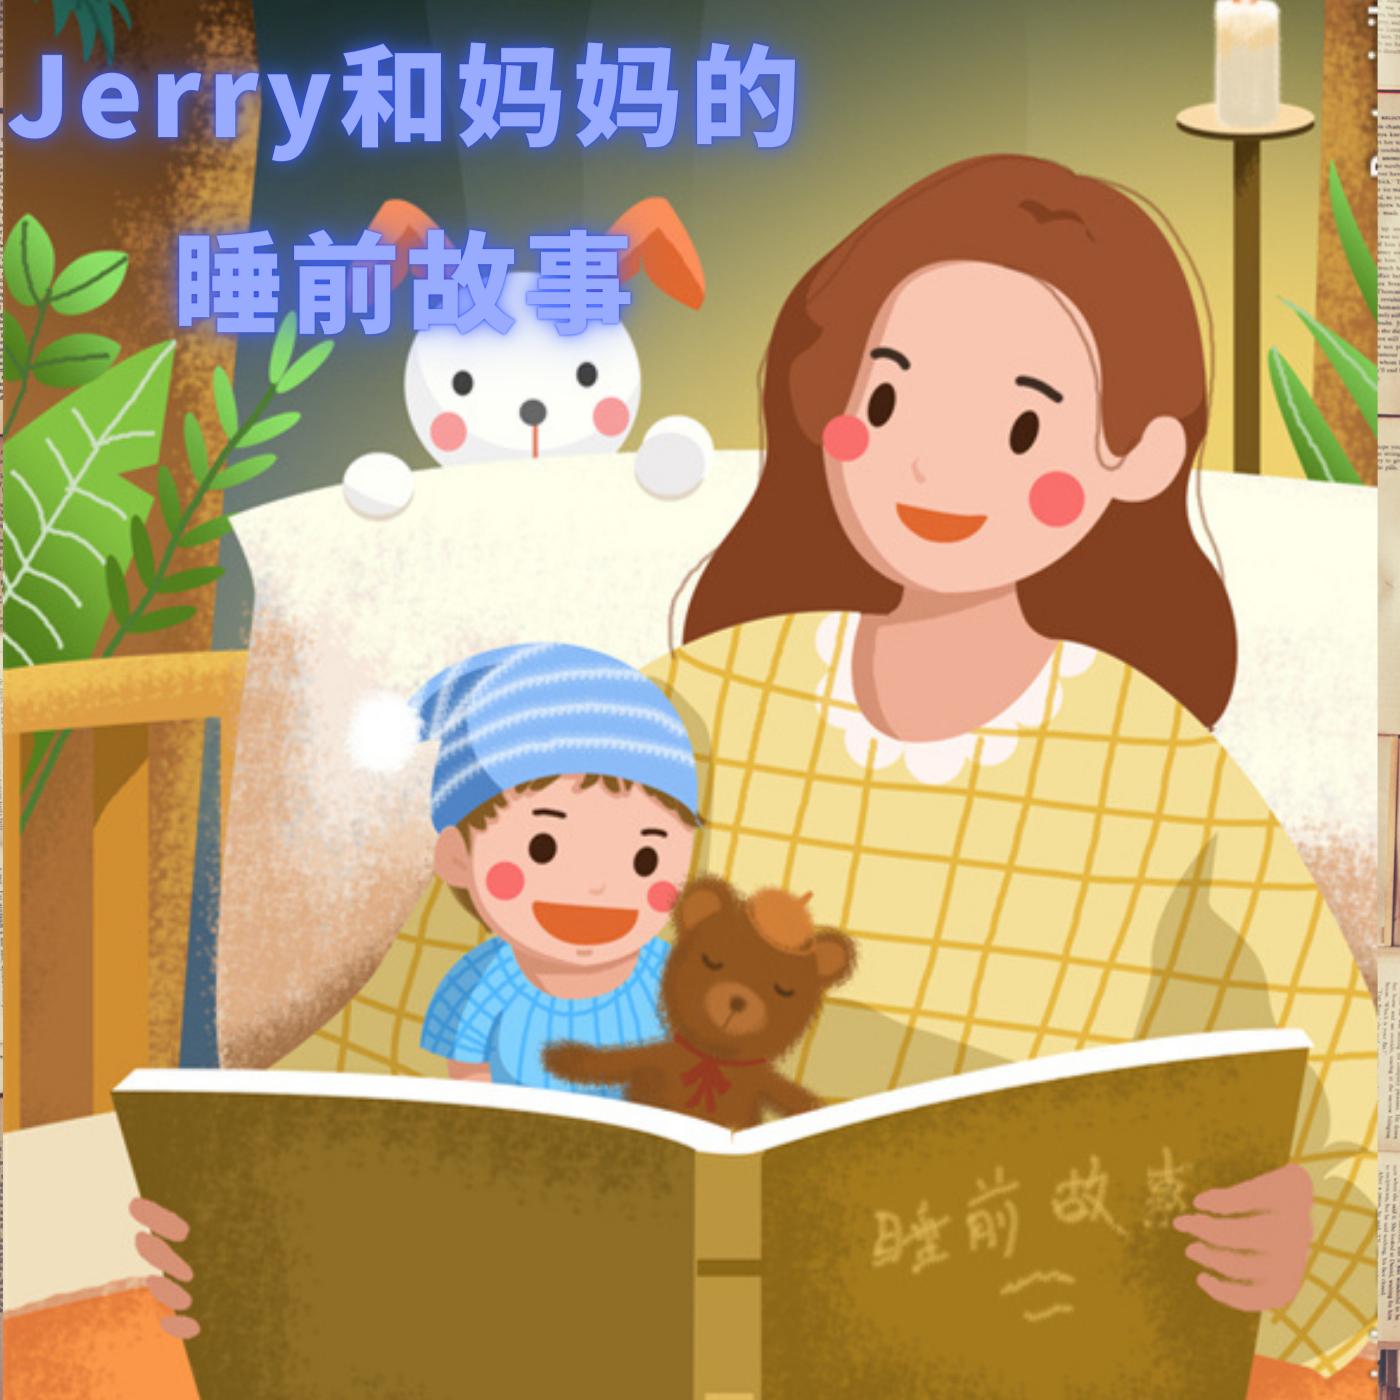 Jerry和妈妈的睡前故事